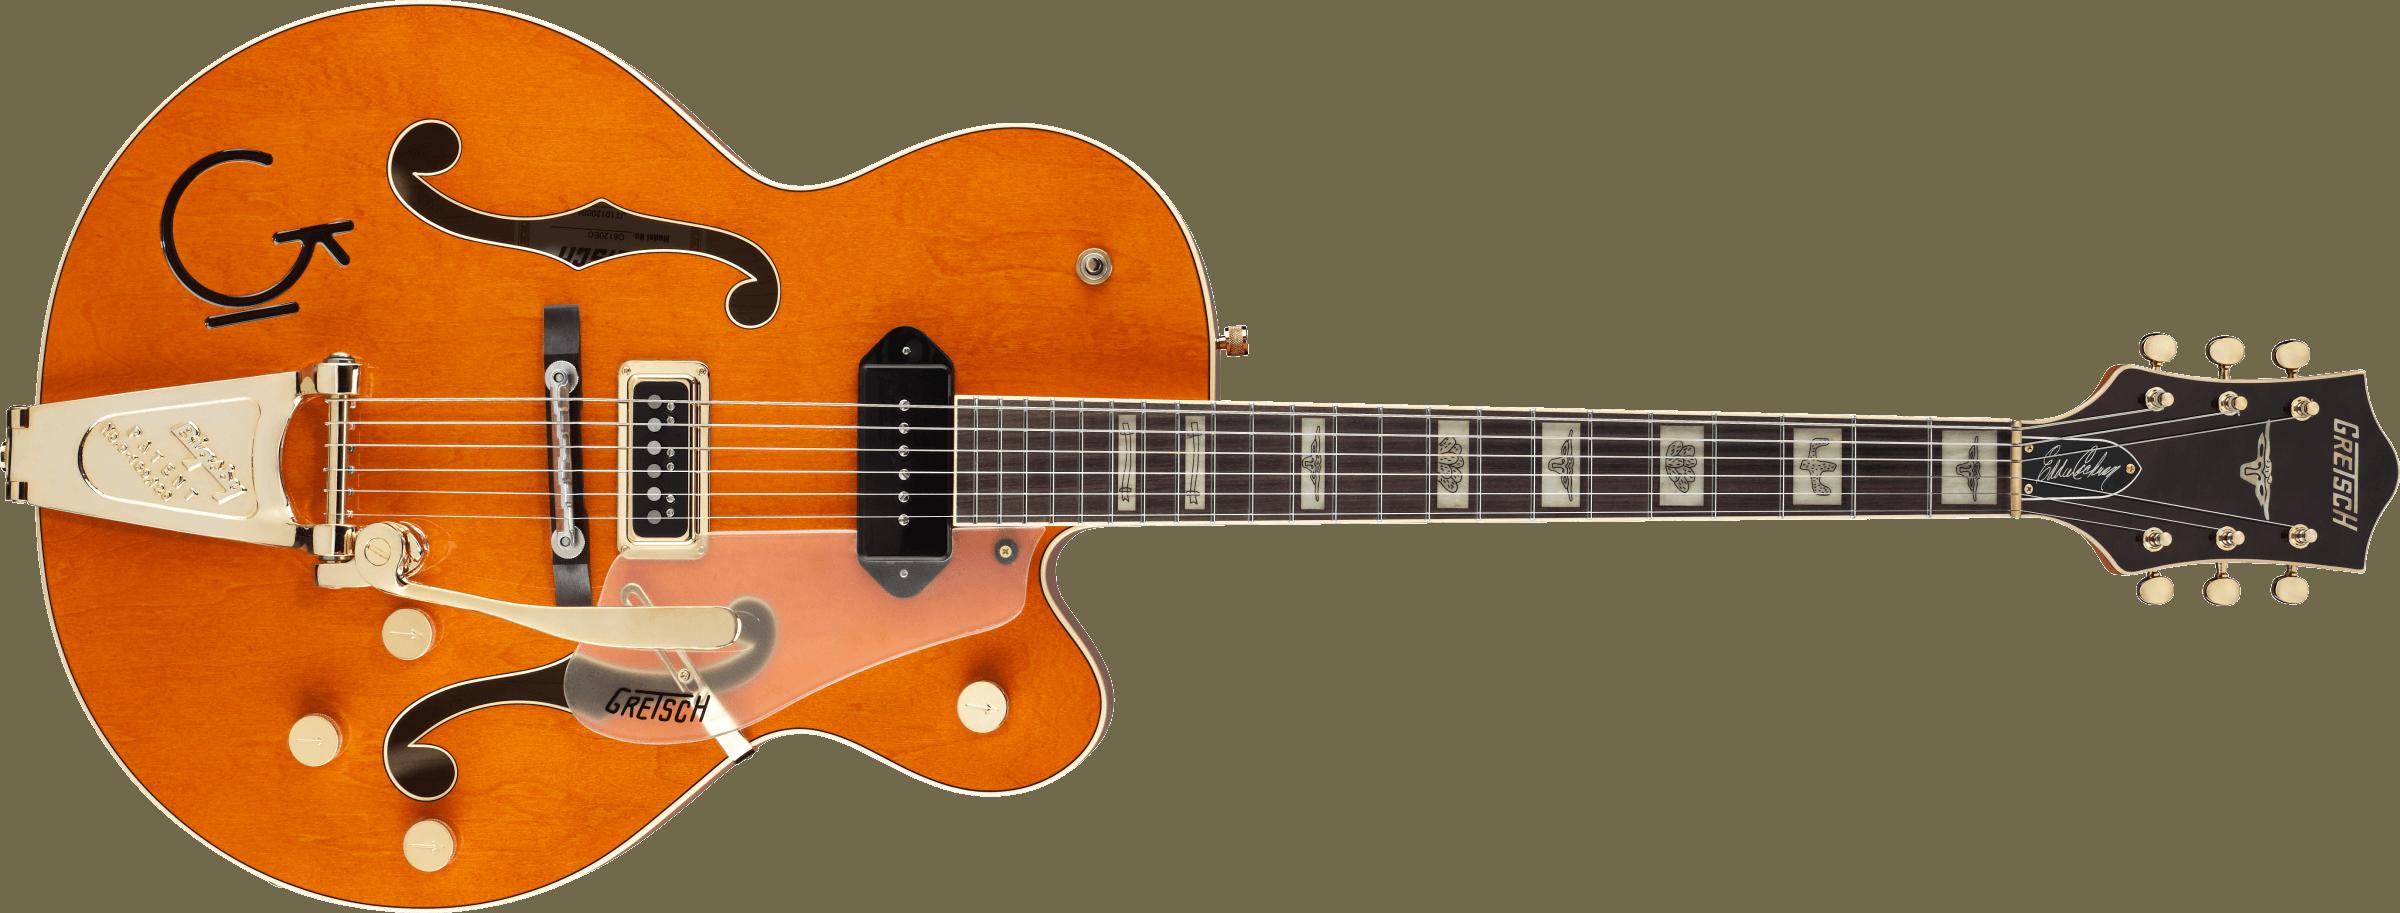 GRETSCH-G6120-Eddie-Cochran-Signature-Hollow-Body-with-Bigsby-Rosewood-Fingerboard-Western-Maple-Stain-sku-571001299